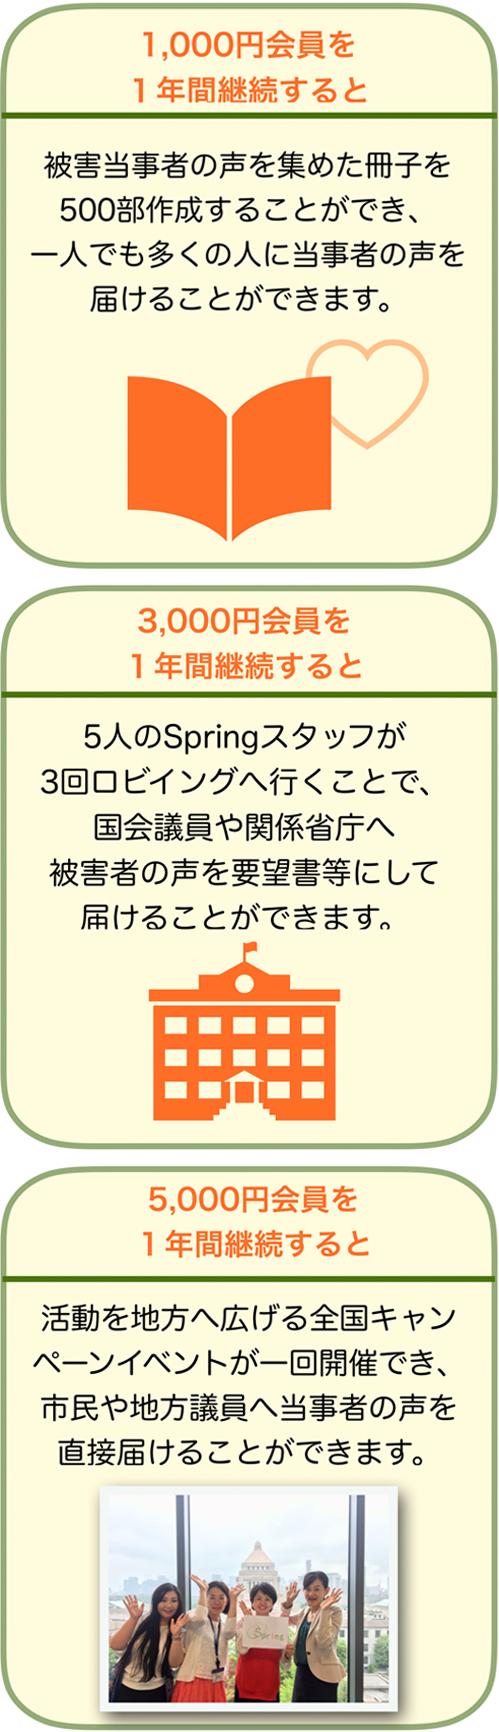 Spring会員制度について